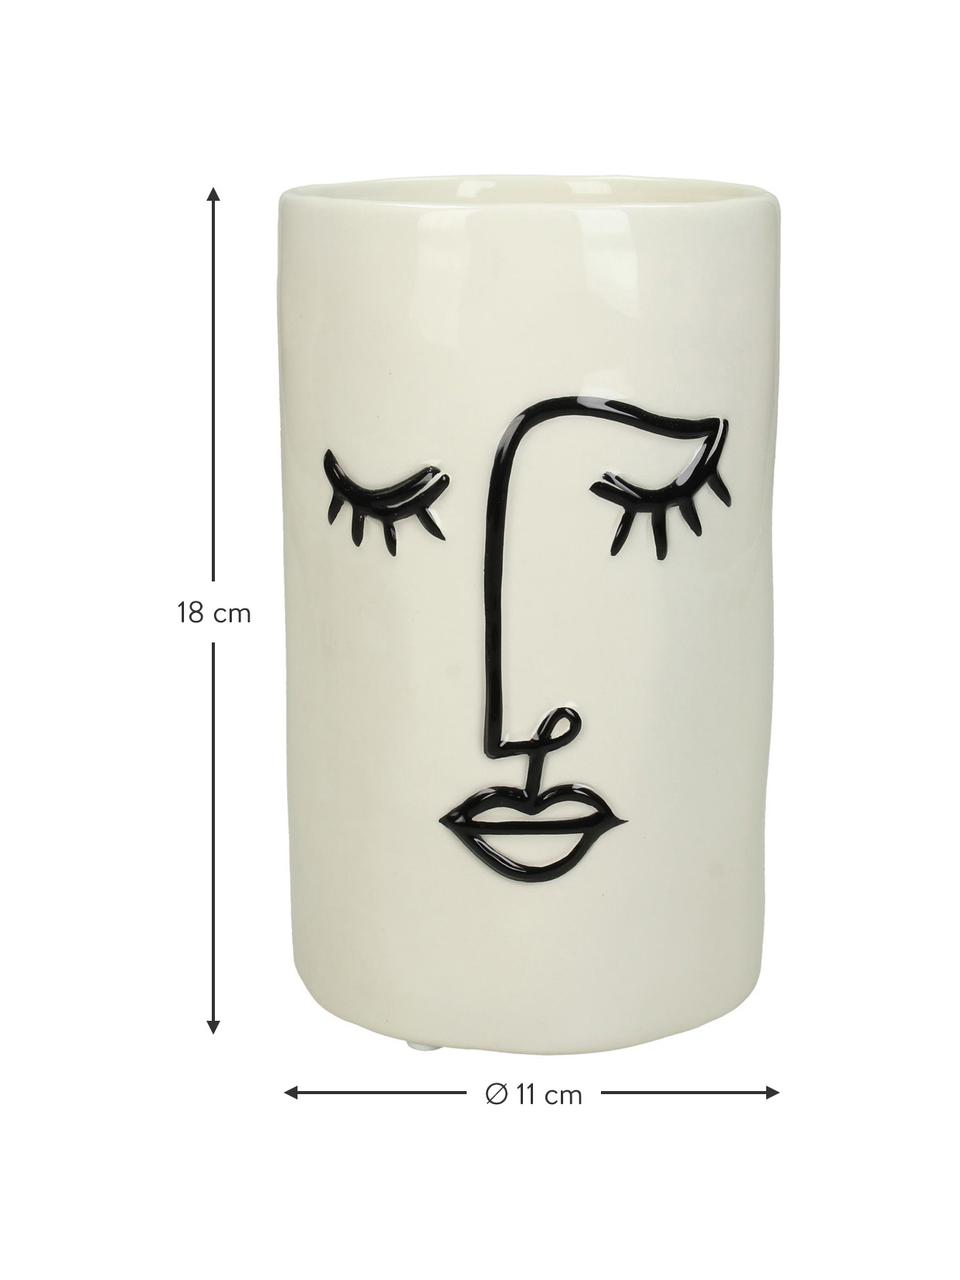 Portavaso di design in gres Face, Terracotta, Bianco latteo, nero, Ø 11 x Alt. 18 cm